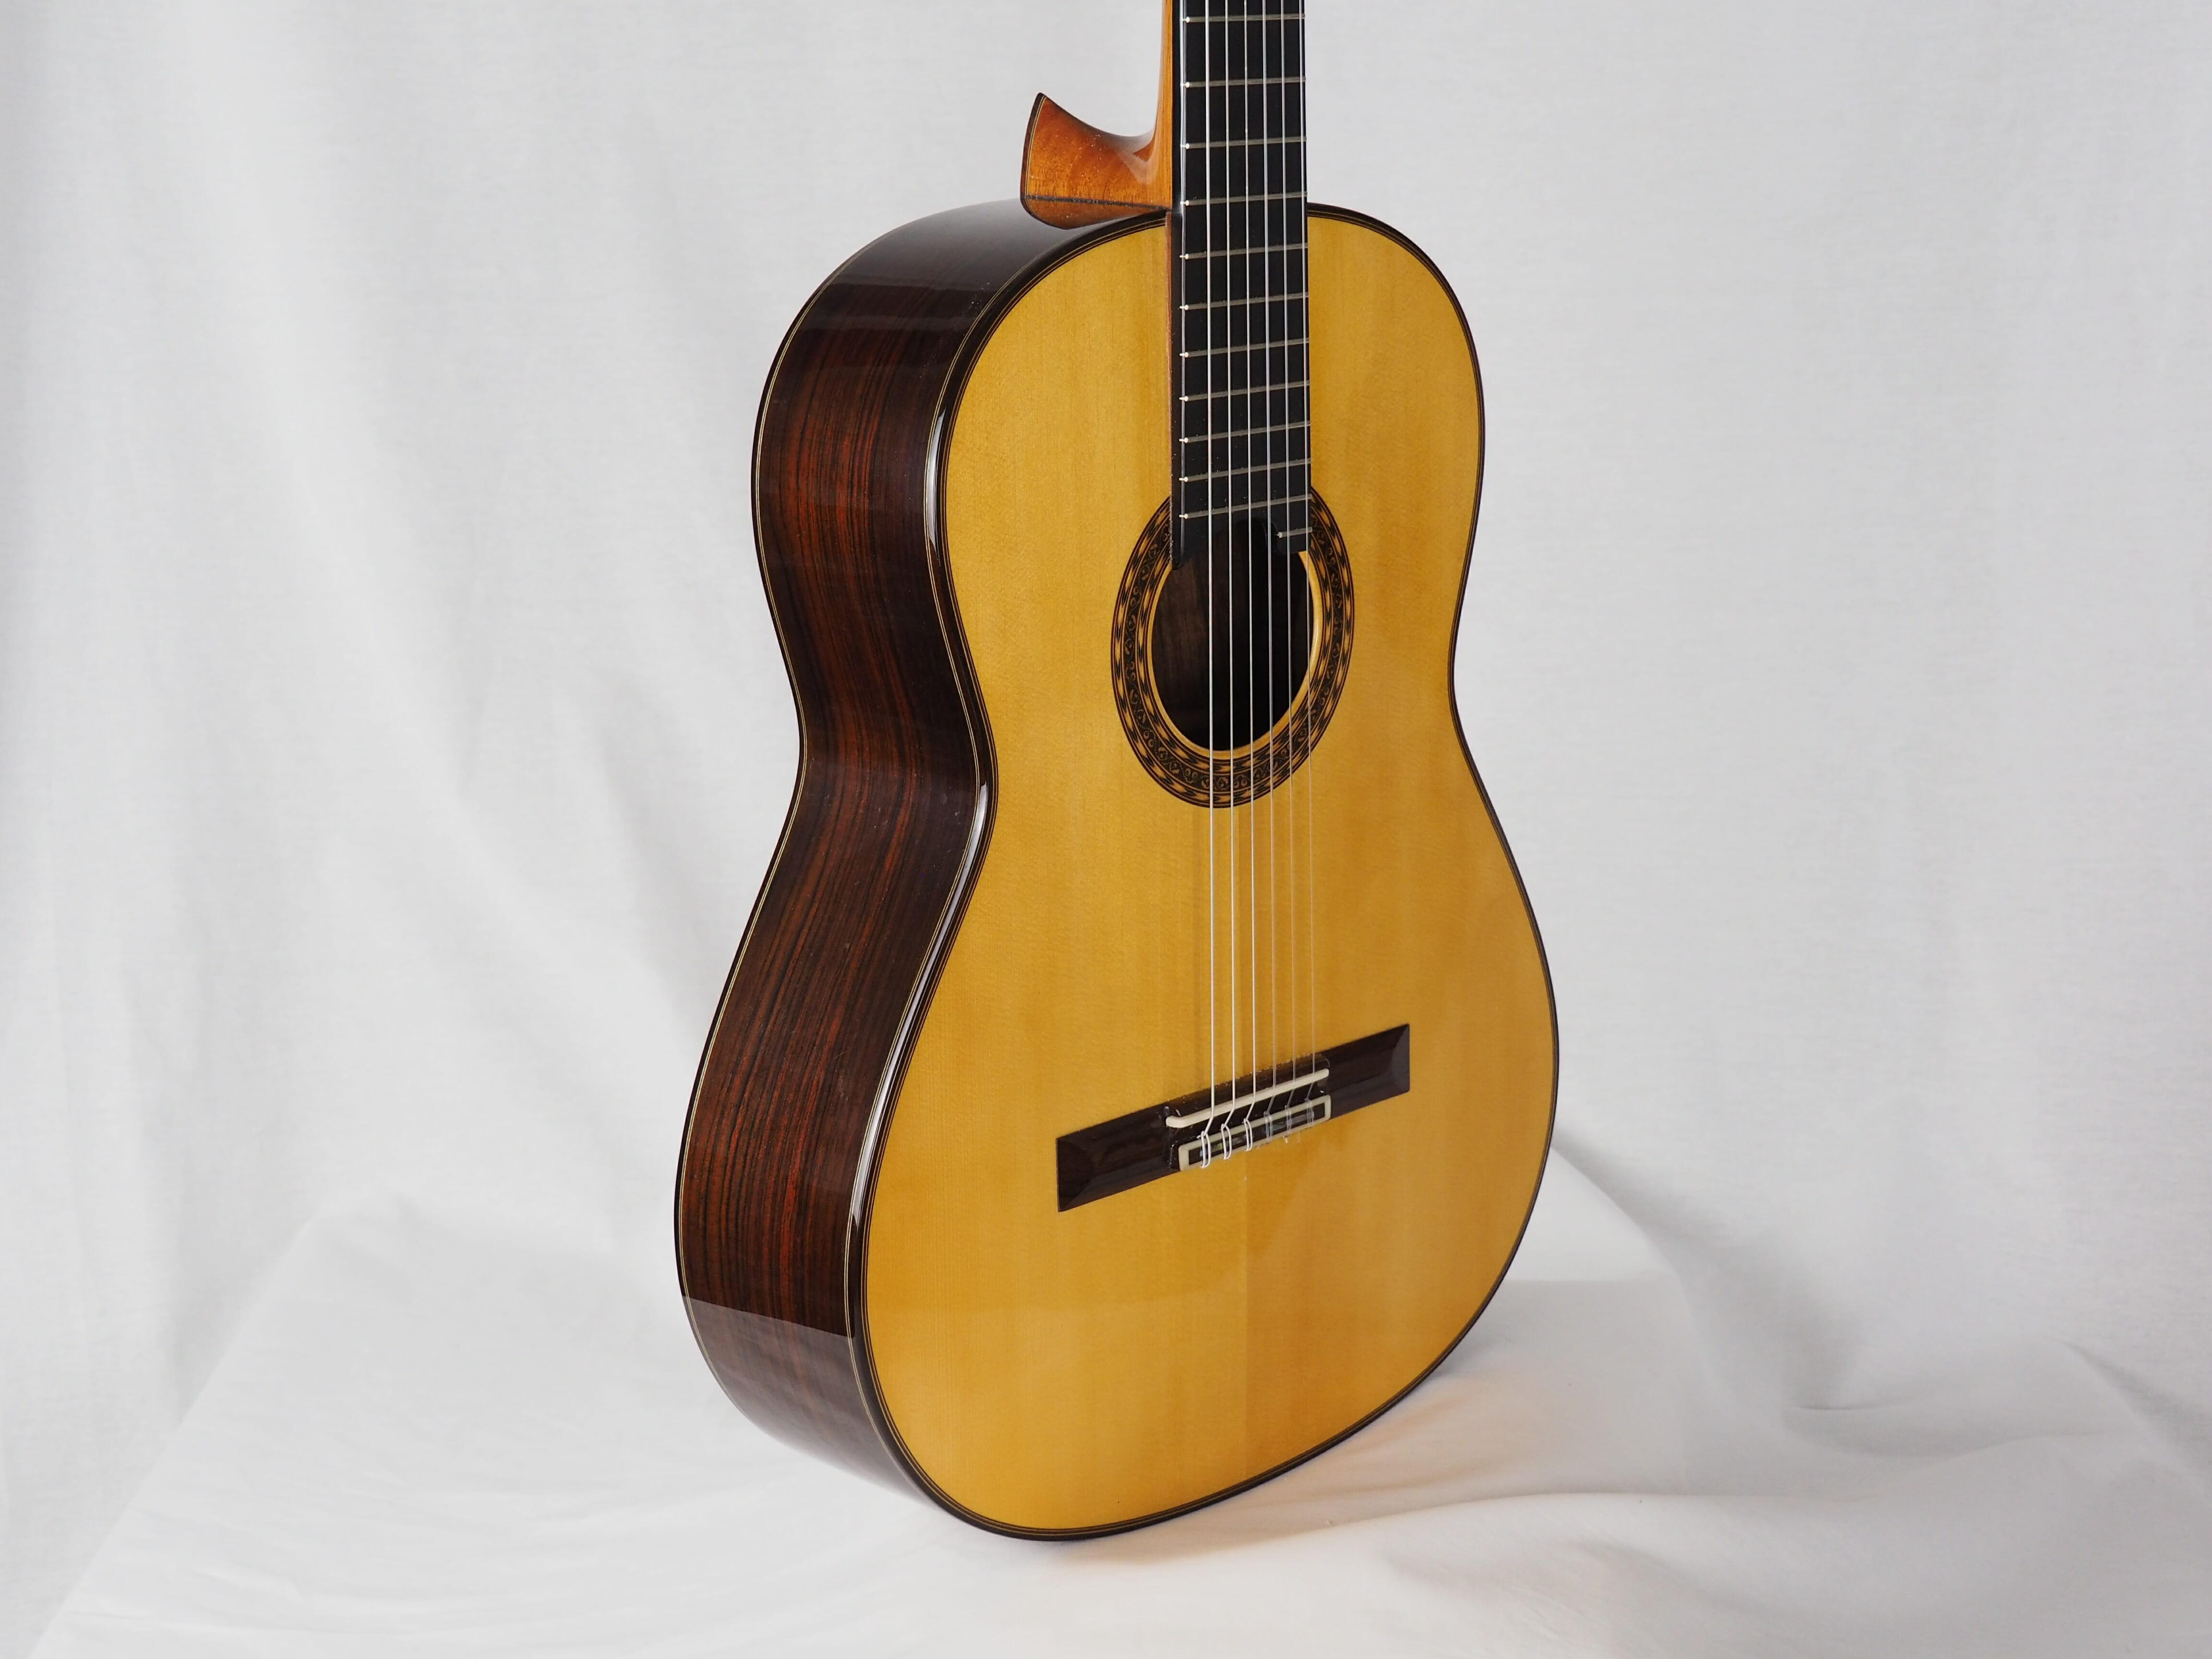 luthier yuichi imai classical guitar 2016 japan classical concert guitar. Black Bedroom Furniture Sets. Home Design Ideas